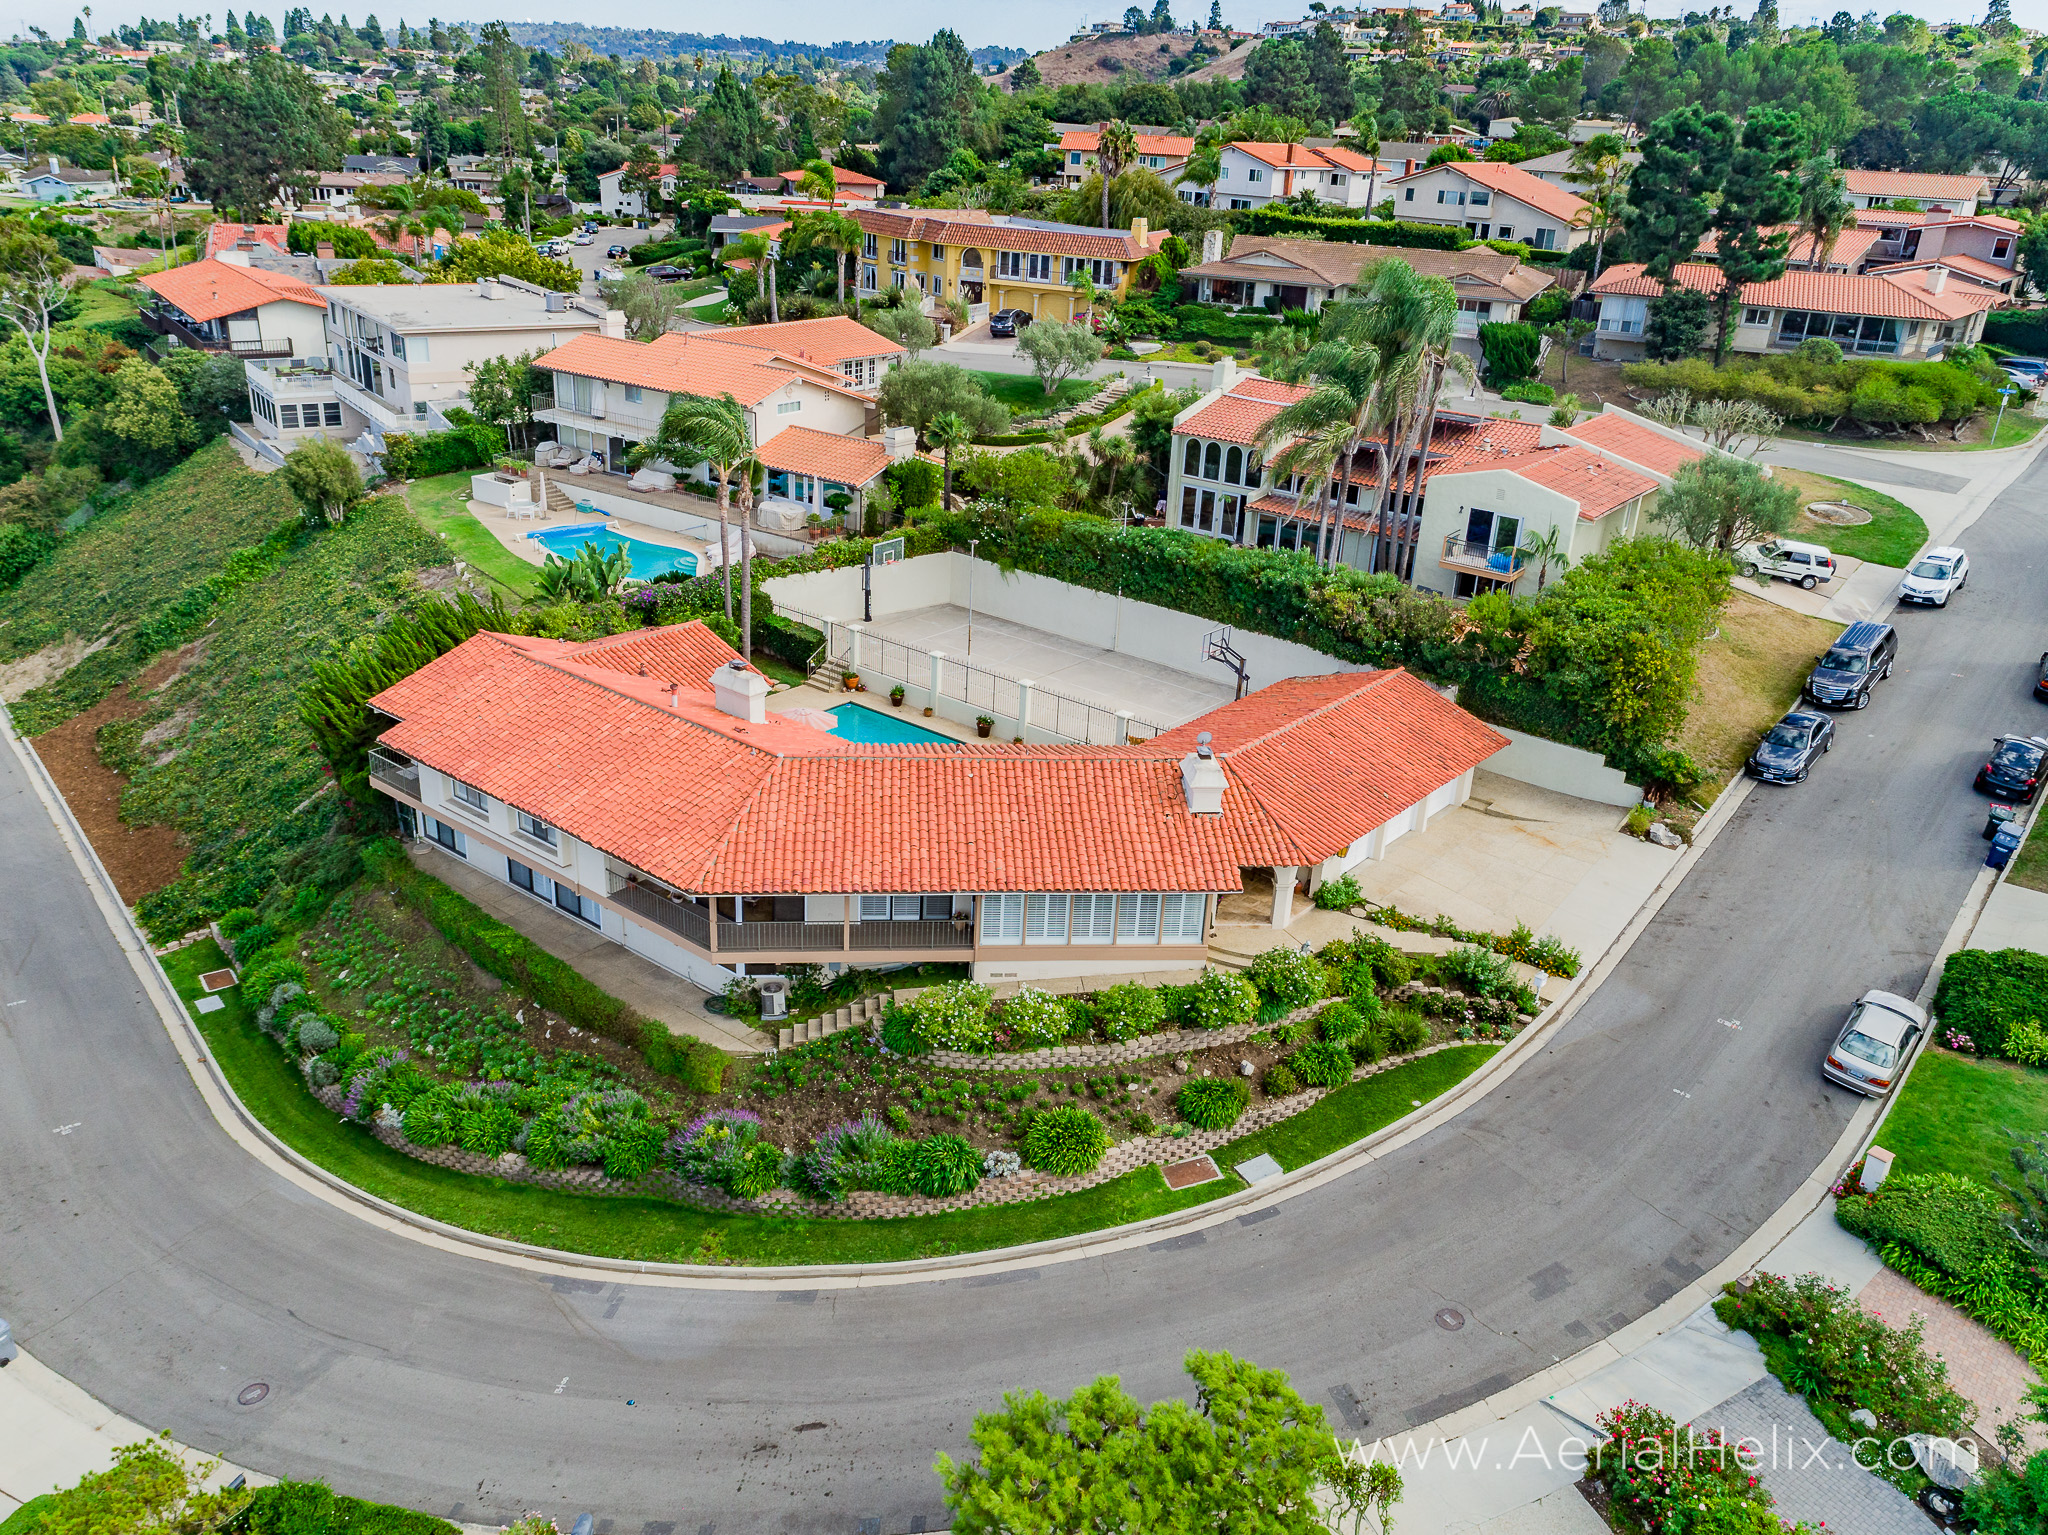 Woodfern Drive - HELIX Real Estate Aerial Photographer-10.jpg